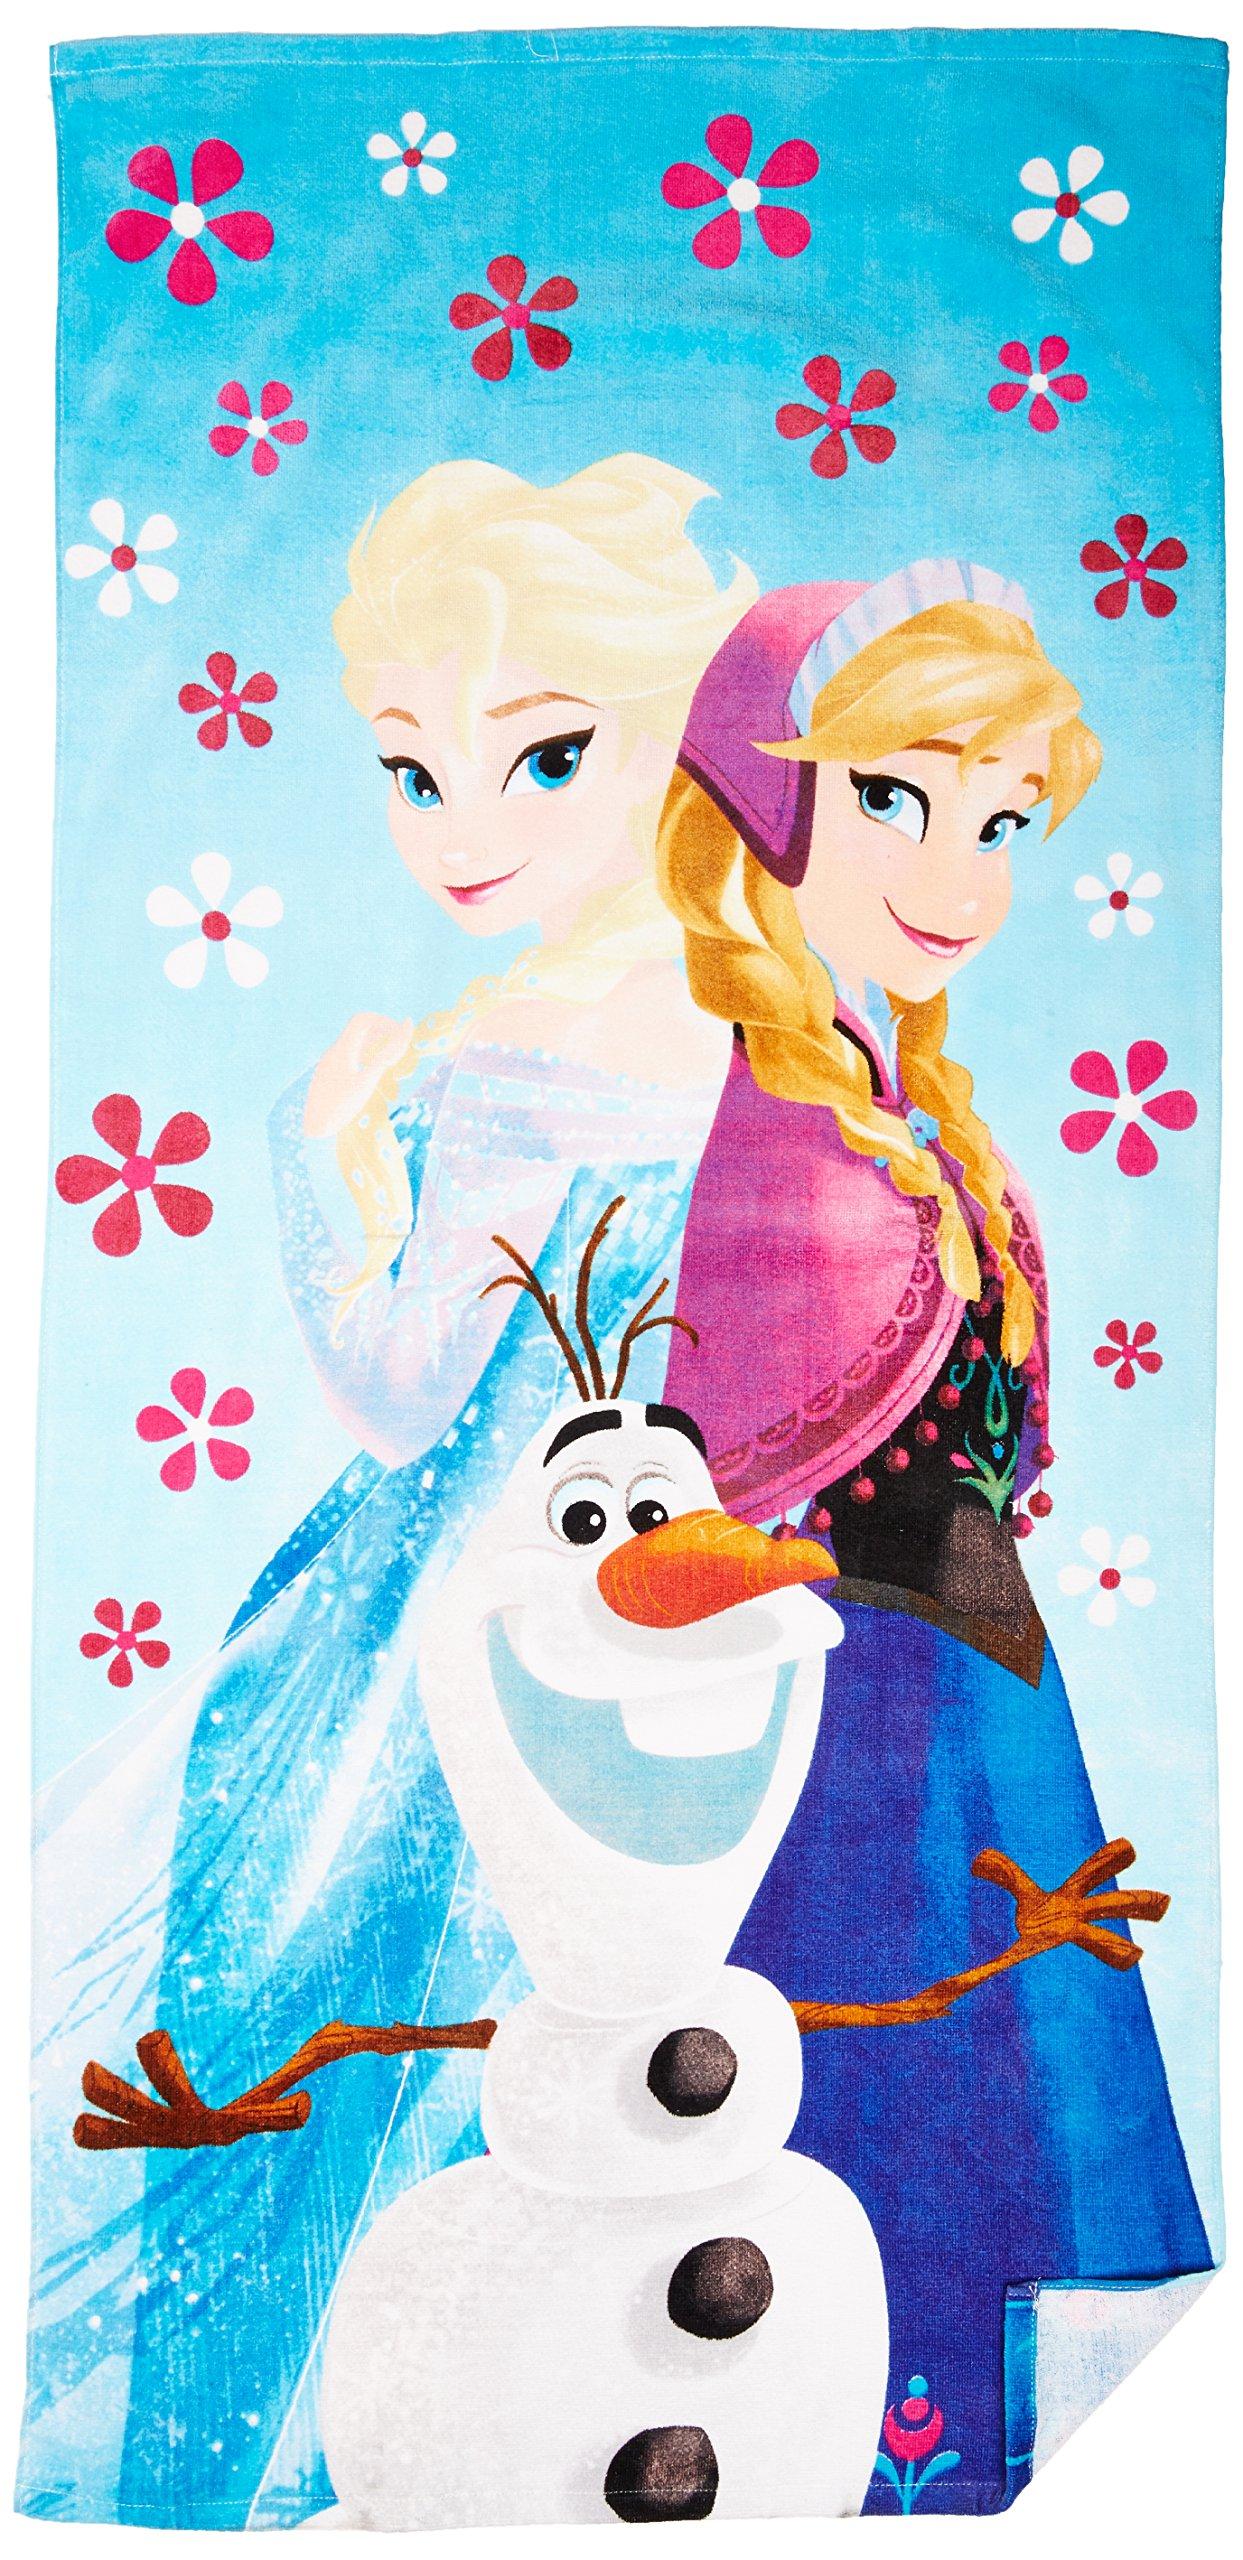 Disney Frozen Celebrate Summer Bath or Beach Cotton Towel. Anna, Elsa Olaf Print. Favorite Princess Characters from Hit Movie Frozen